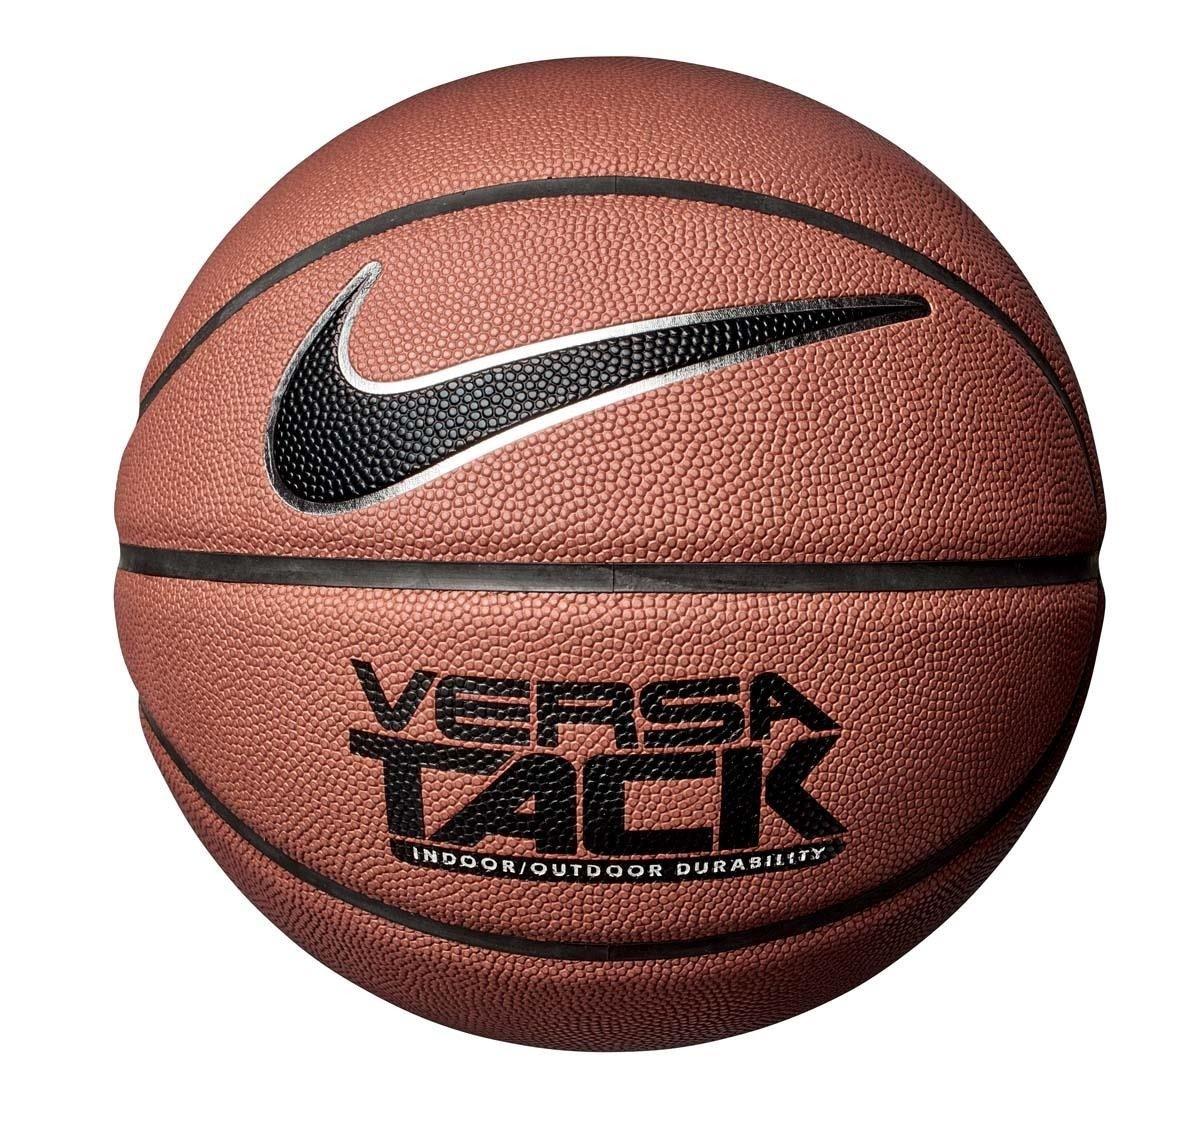 6bd2f9a6 Piłka do koszykówki Nike Versa Tack 8P r.5 - NKI0185505 - Basketo.pl